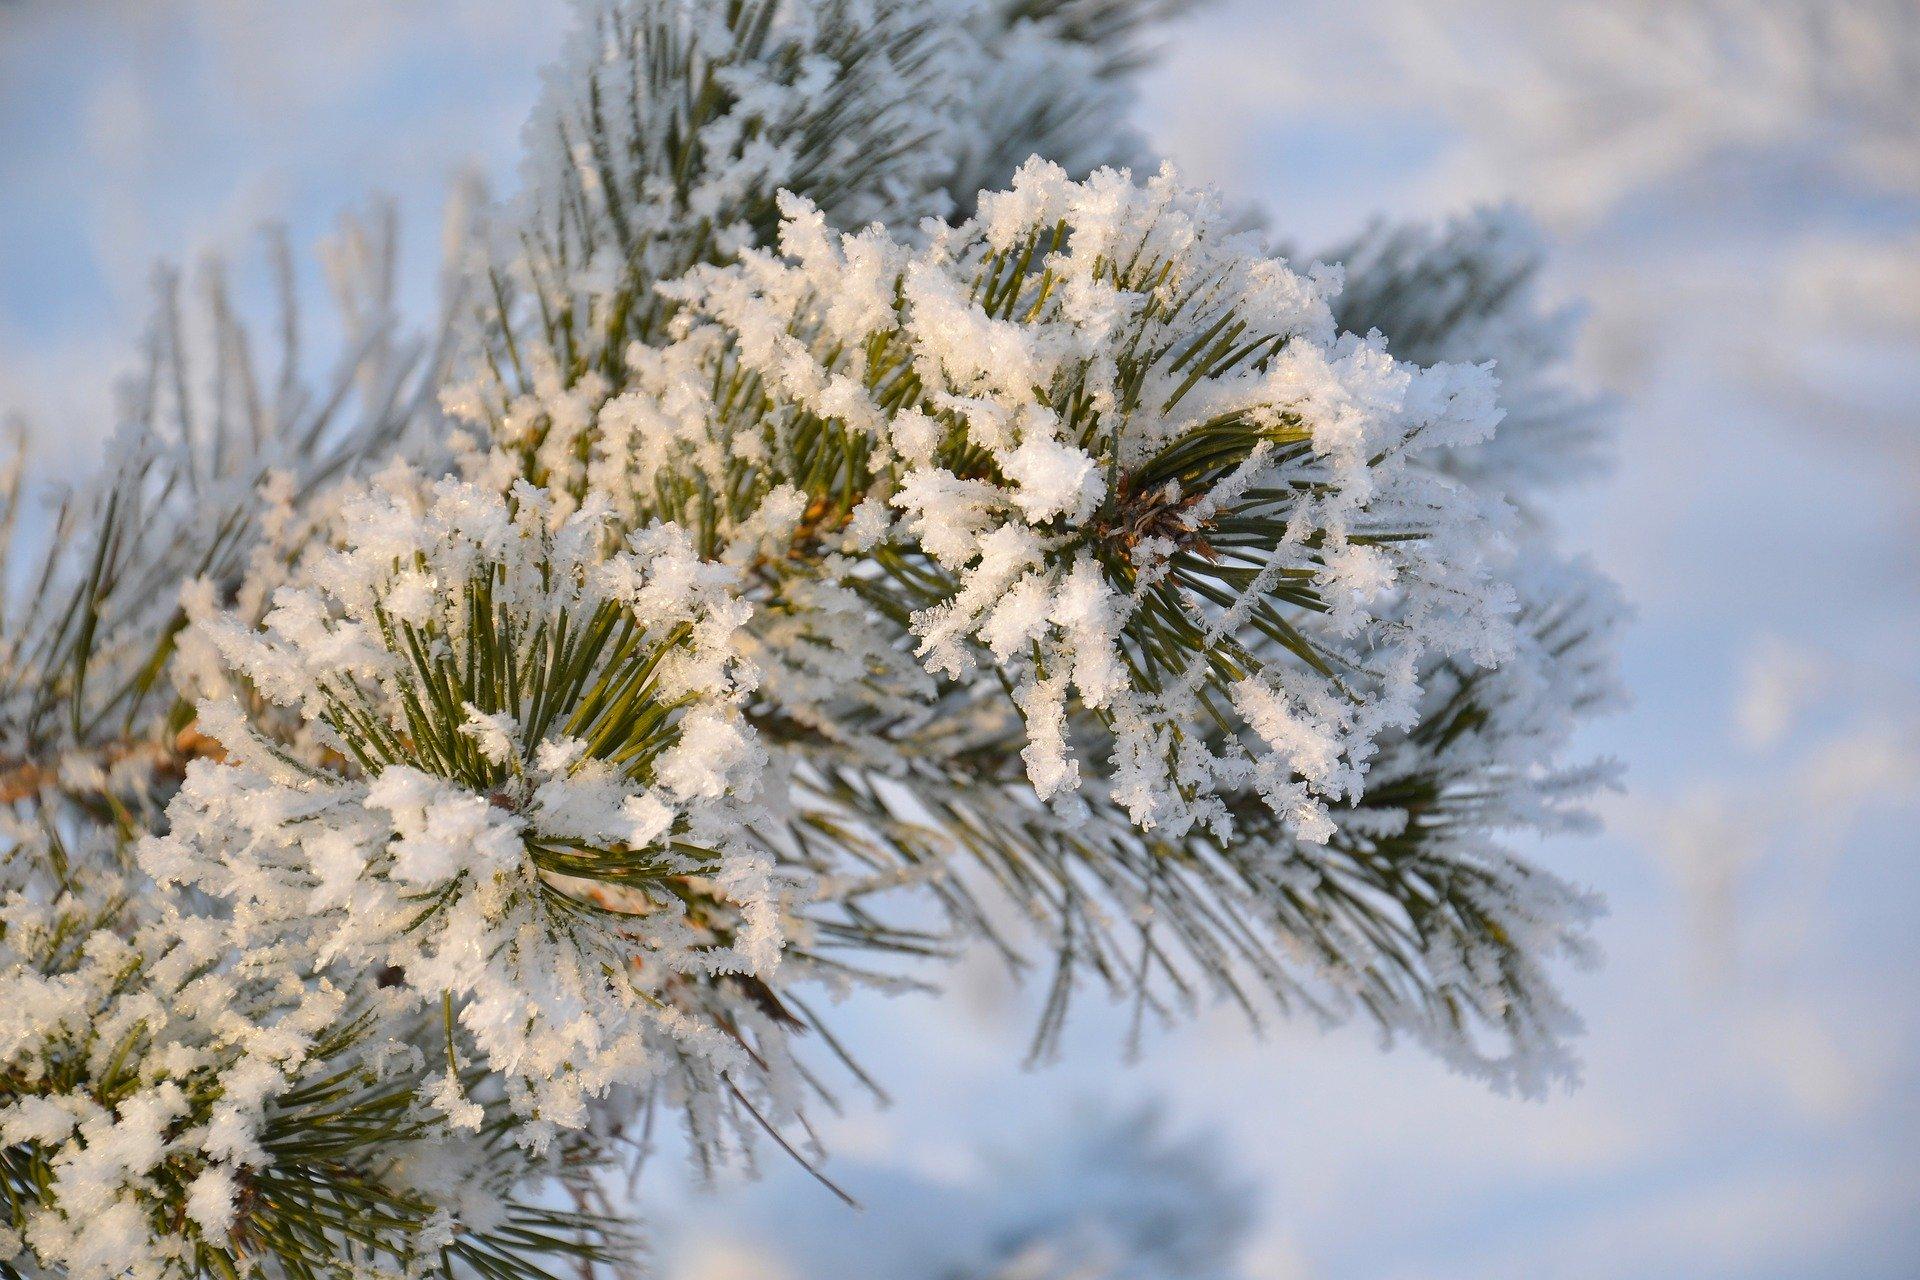 gałązka ze śniegiem